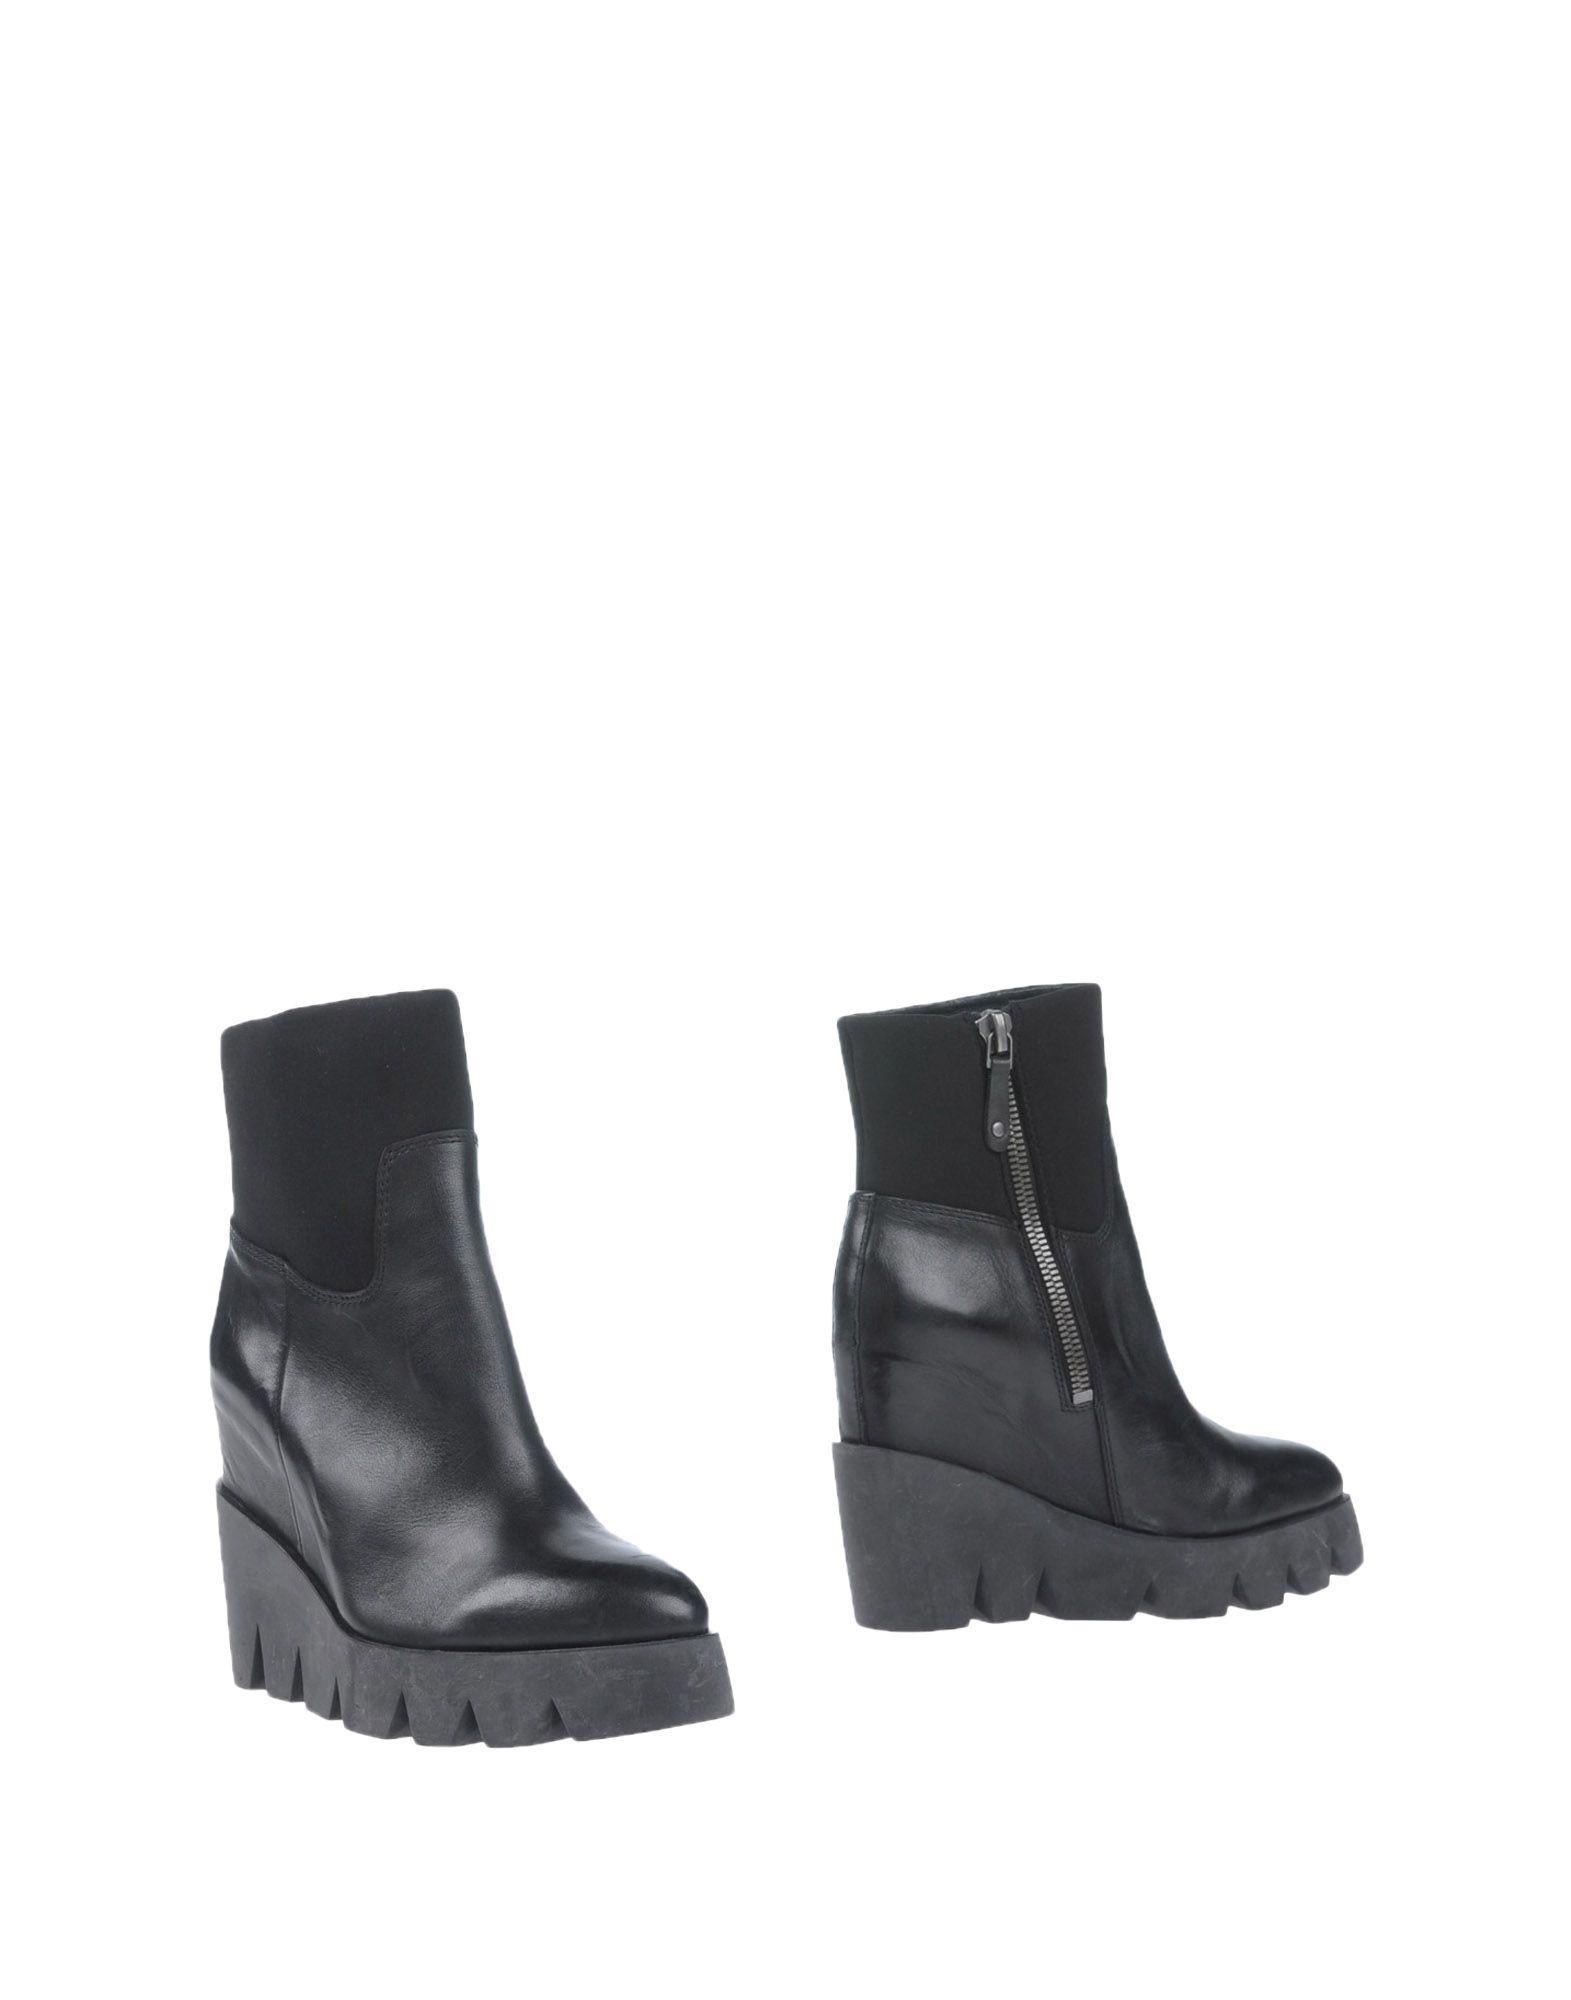 Ash aussehende Stiefelette Damen  11093797IXGut aussehende Ash strapazierfähige Schuhe d8a76e